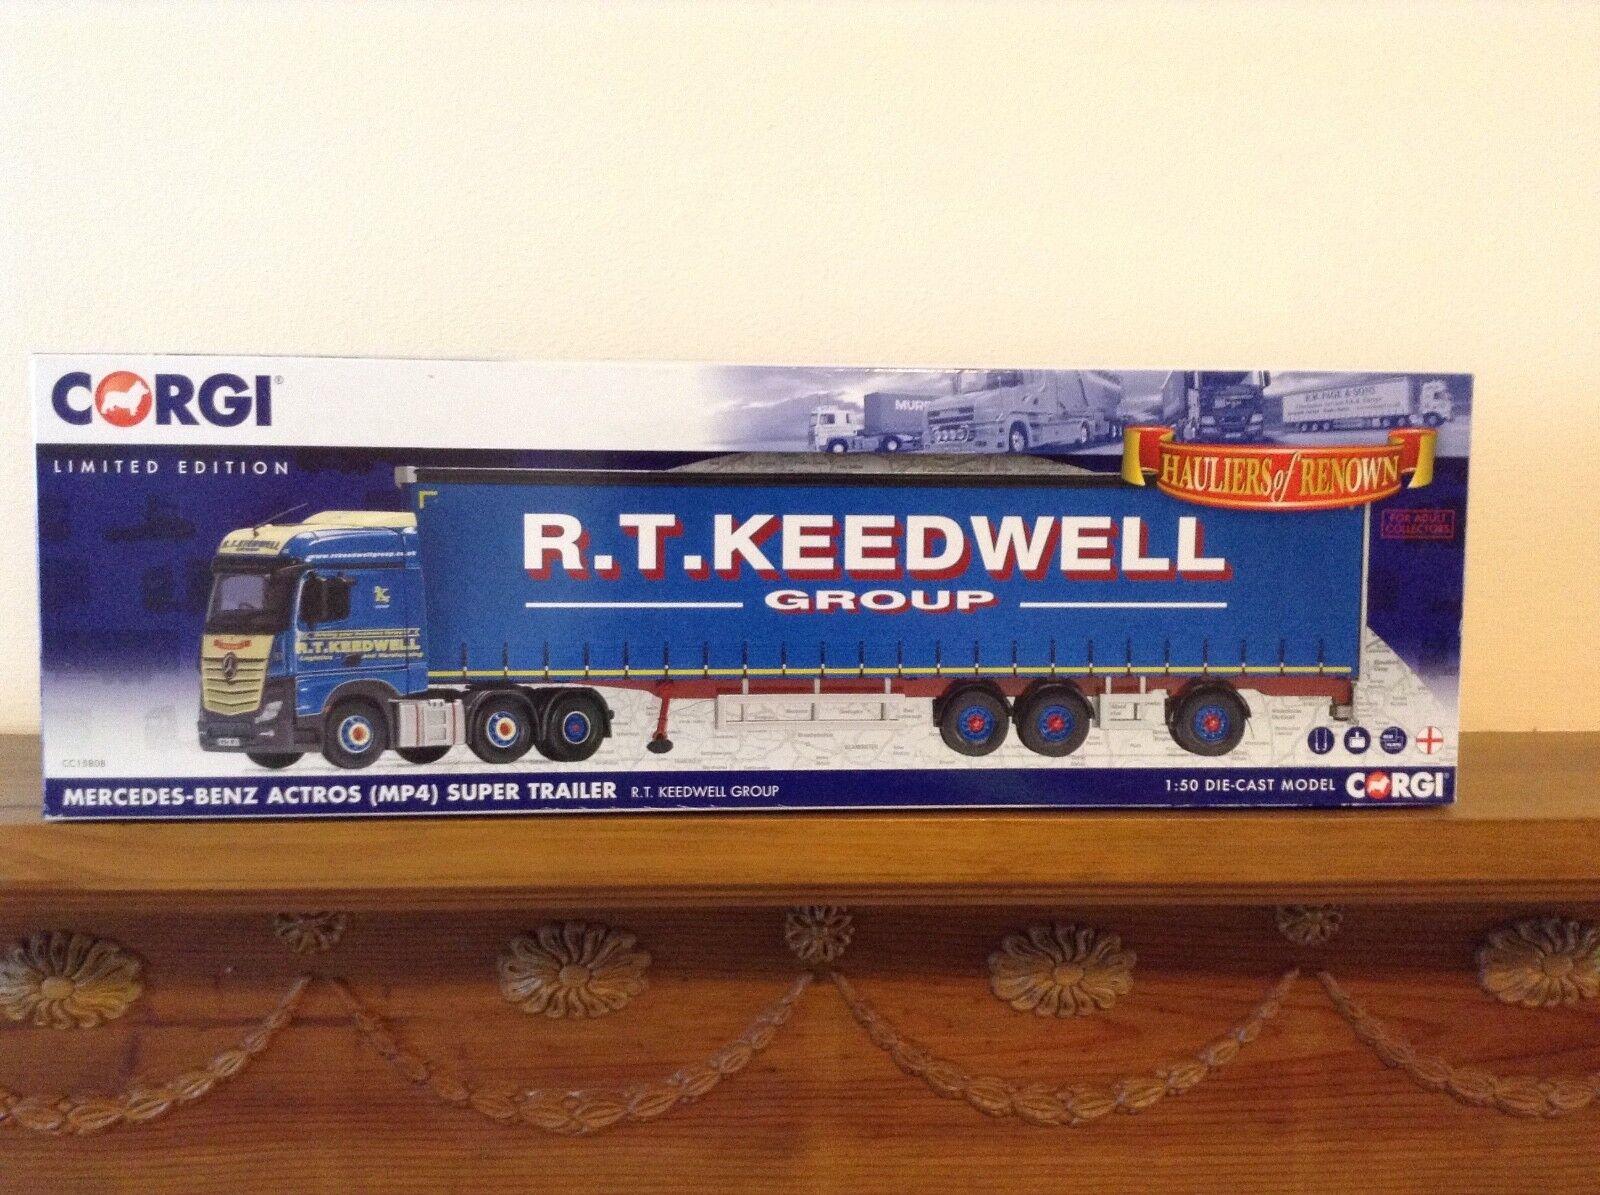 Corgi 1 50 Scale CC15808 R.T.Keedwell